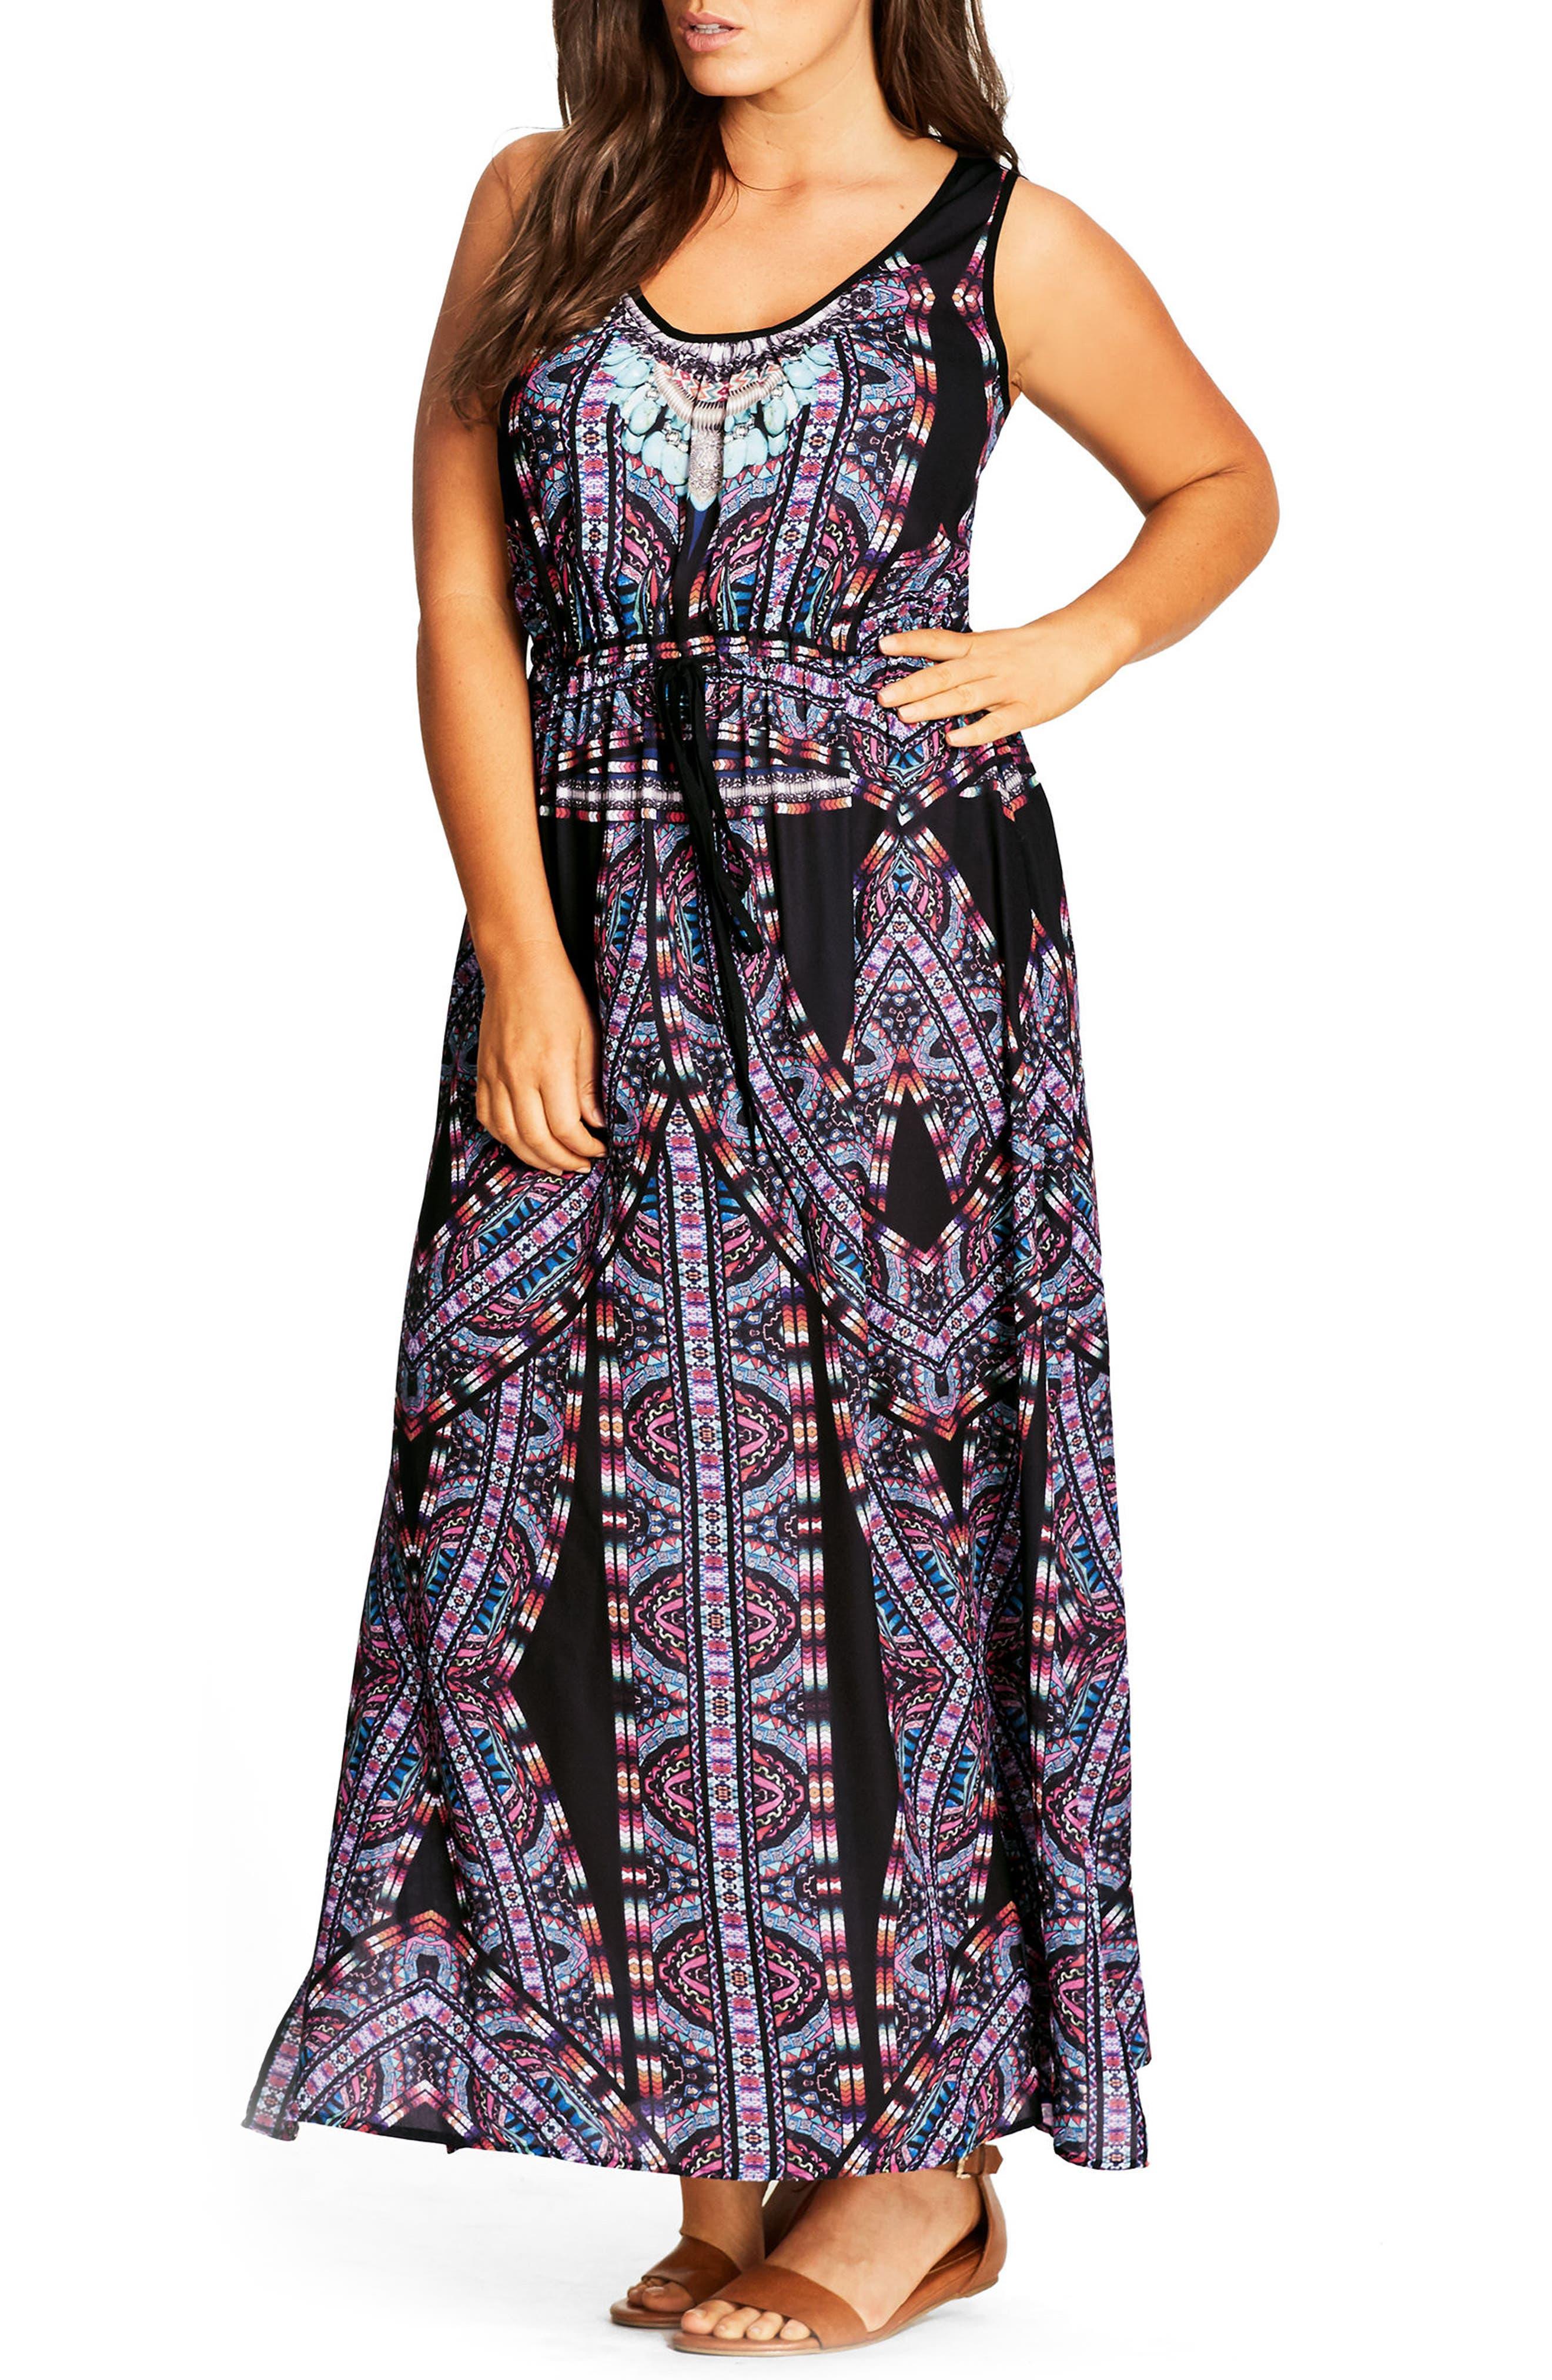 'Biba' Drawstring Maxi Dress,                             Main thumbnail 1, color,